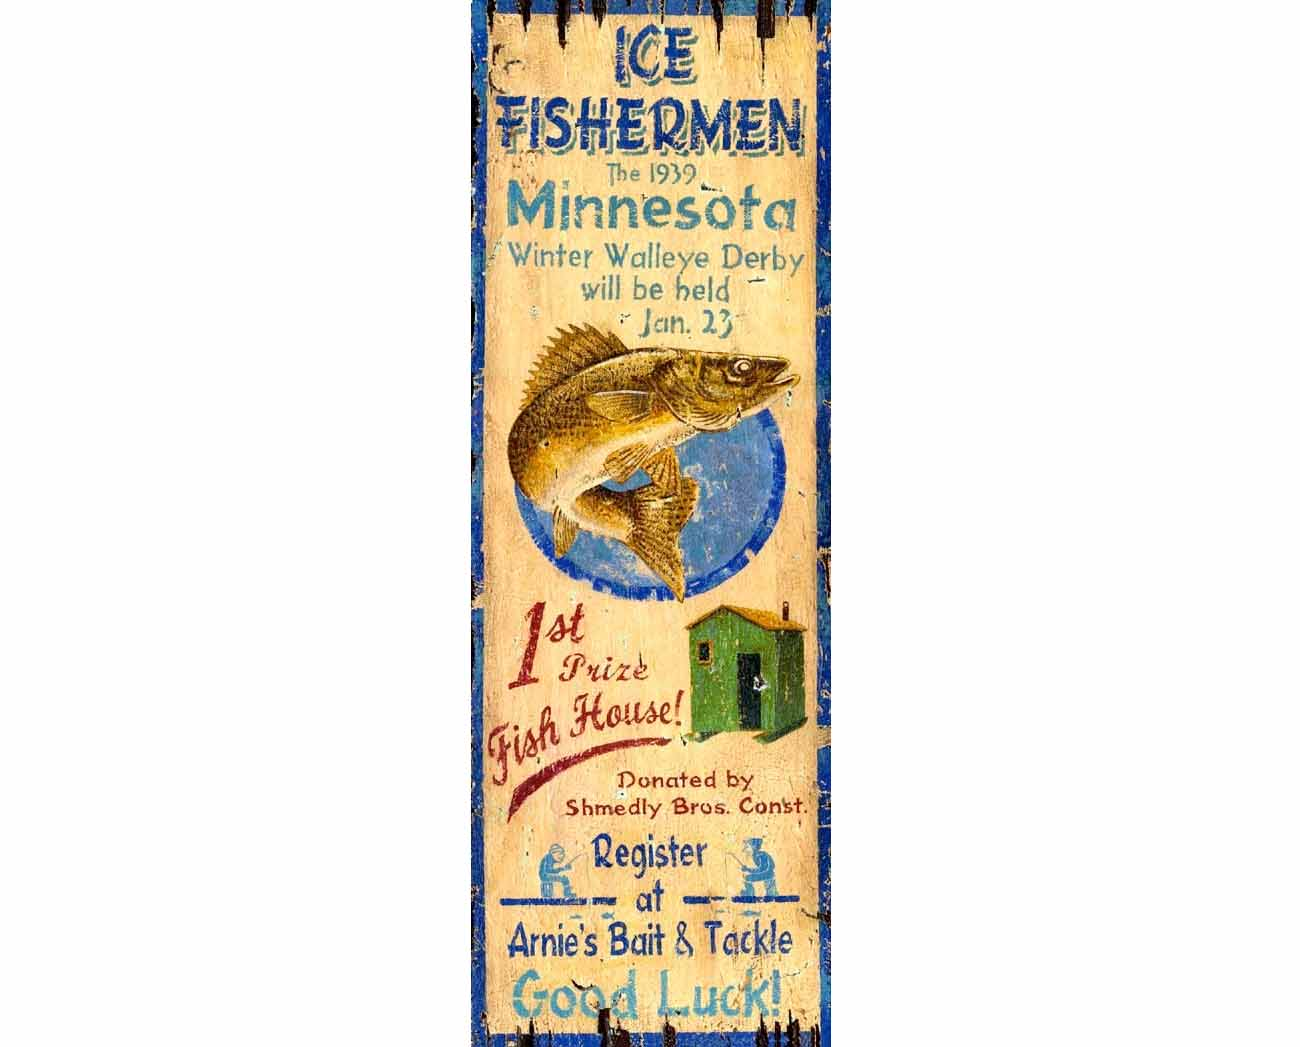 Ice Fishing Vintage Sign